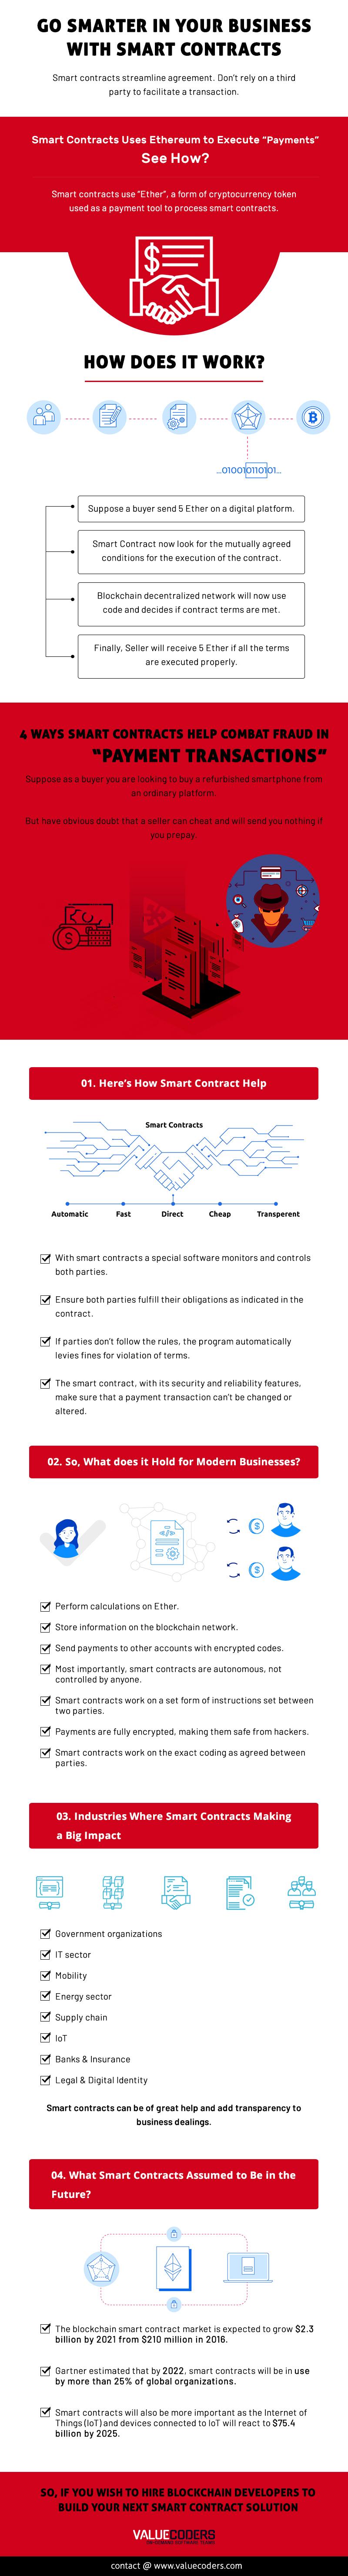 Benefits of smart contract 2019